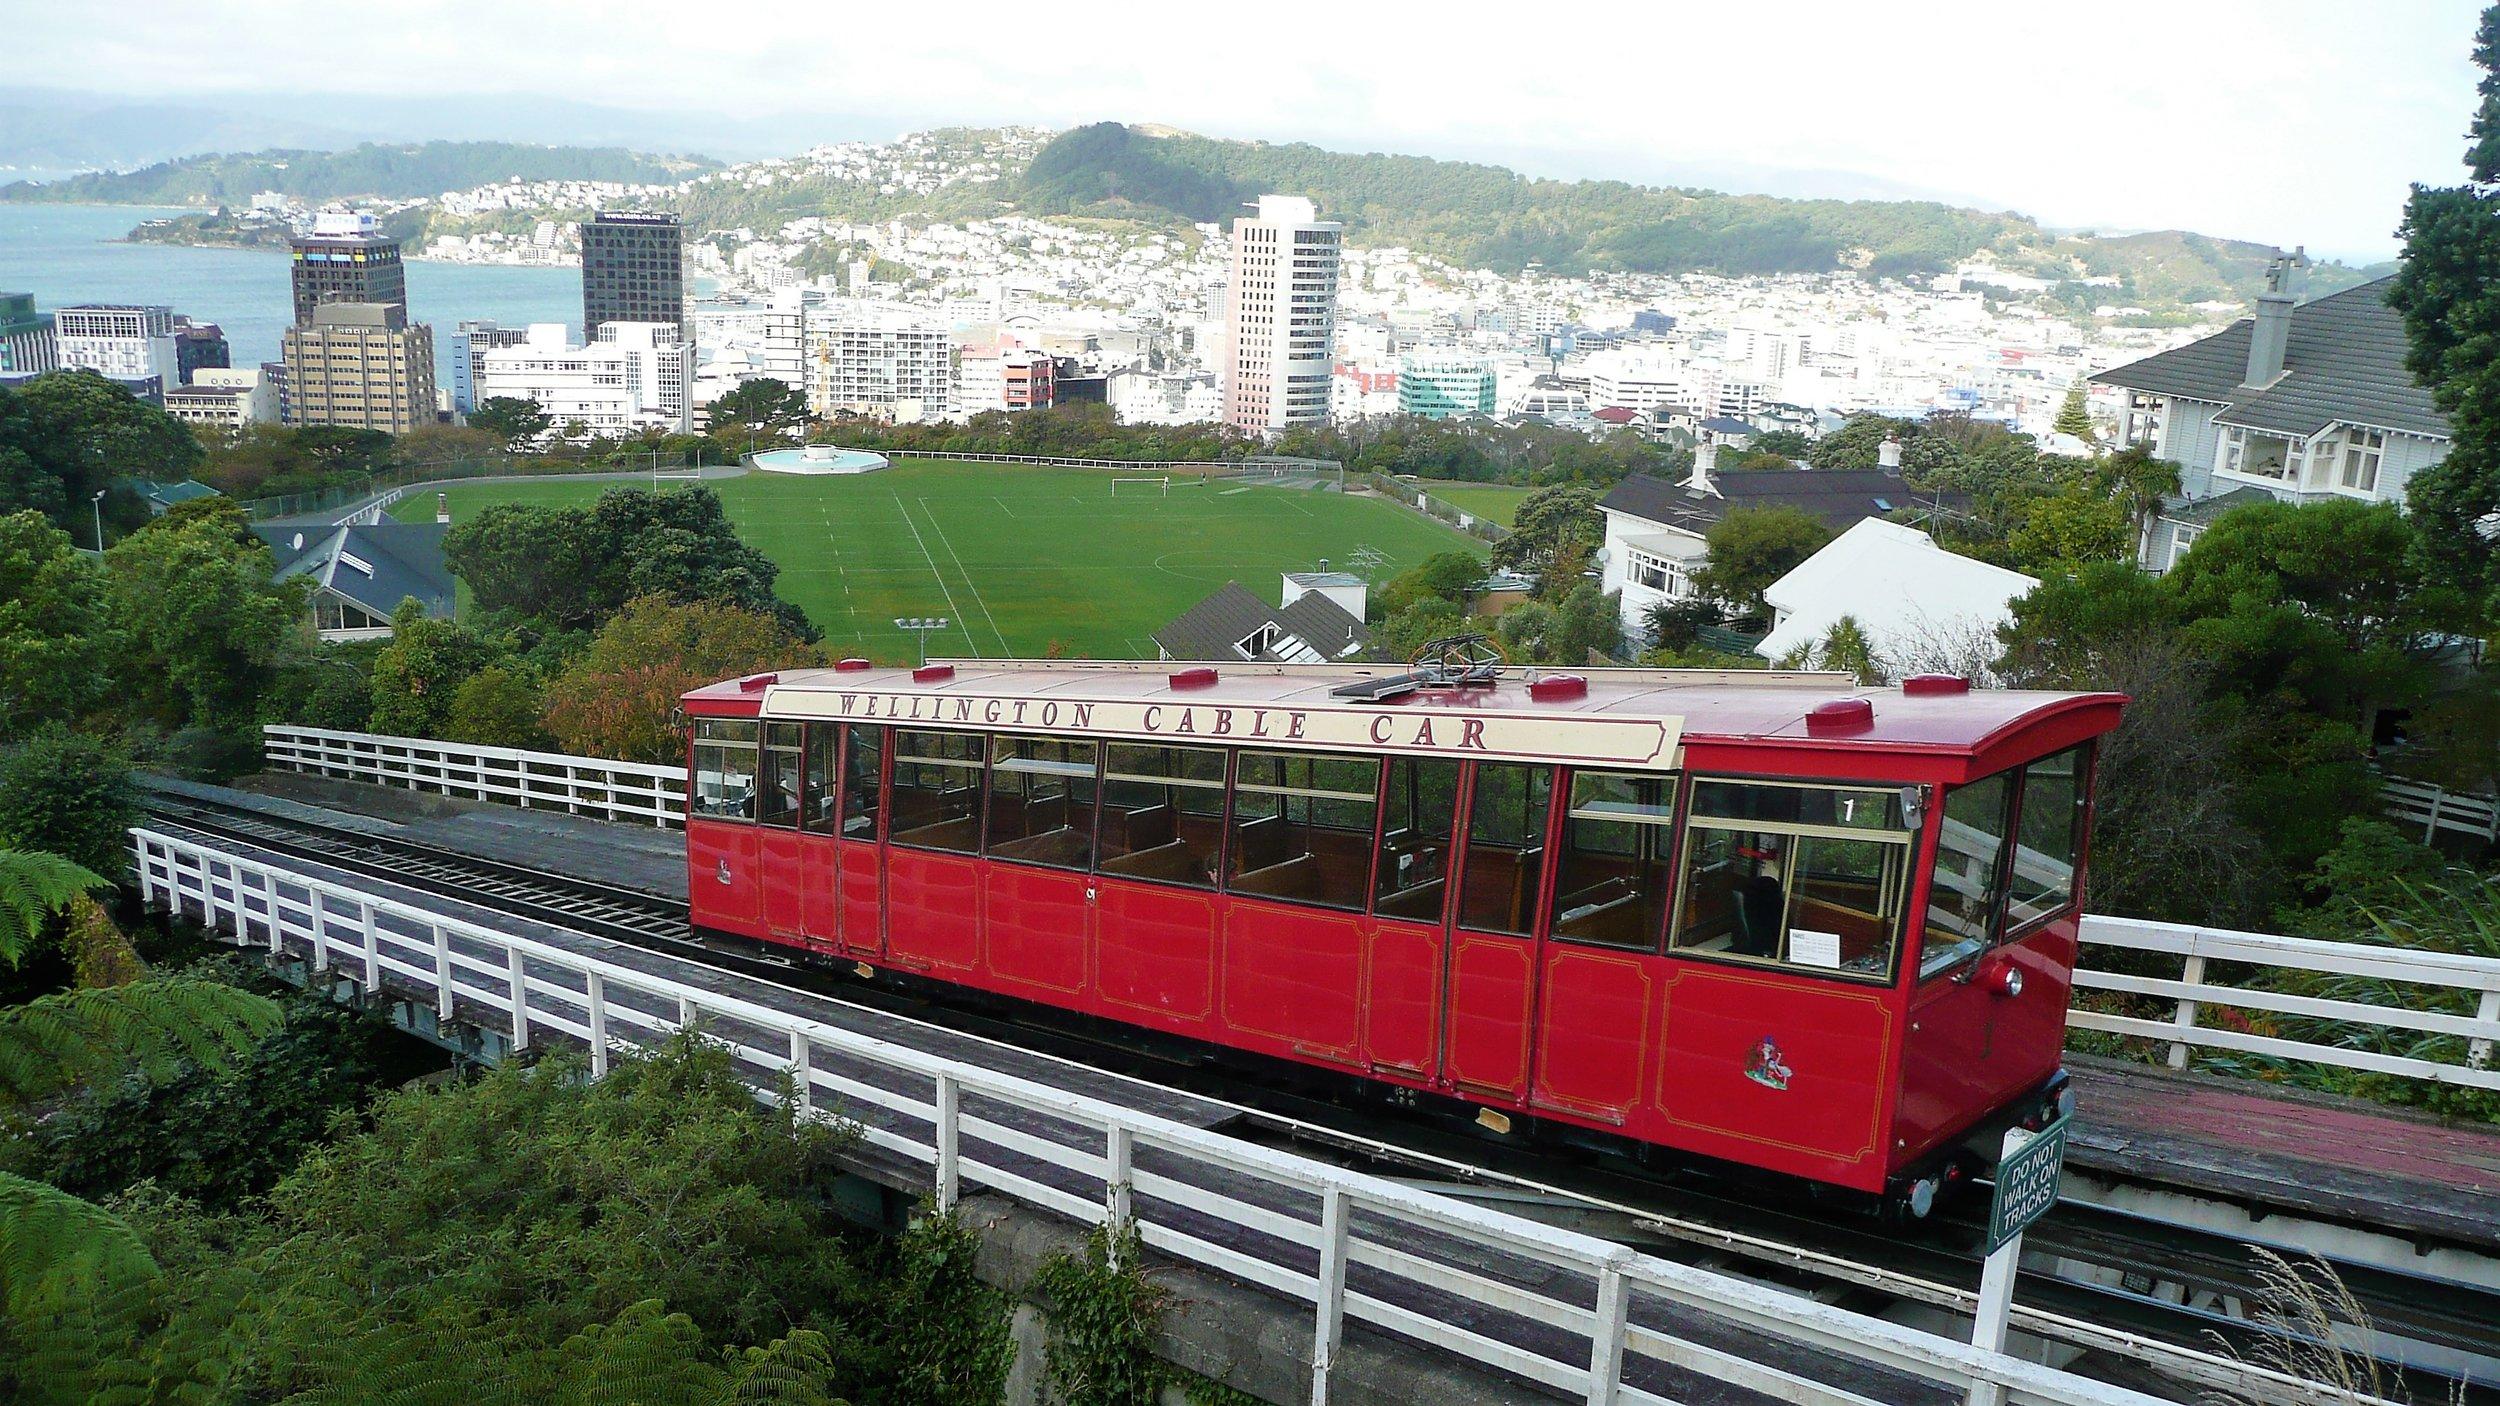 famous View over Wellington